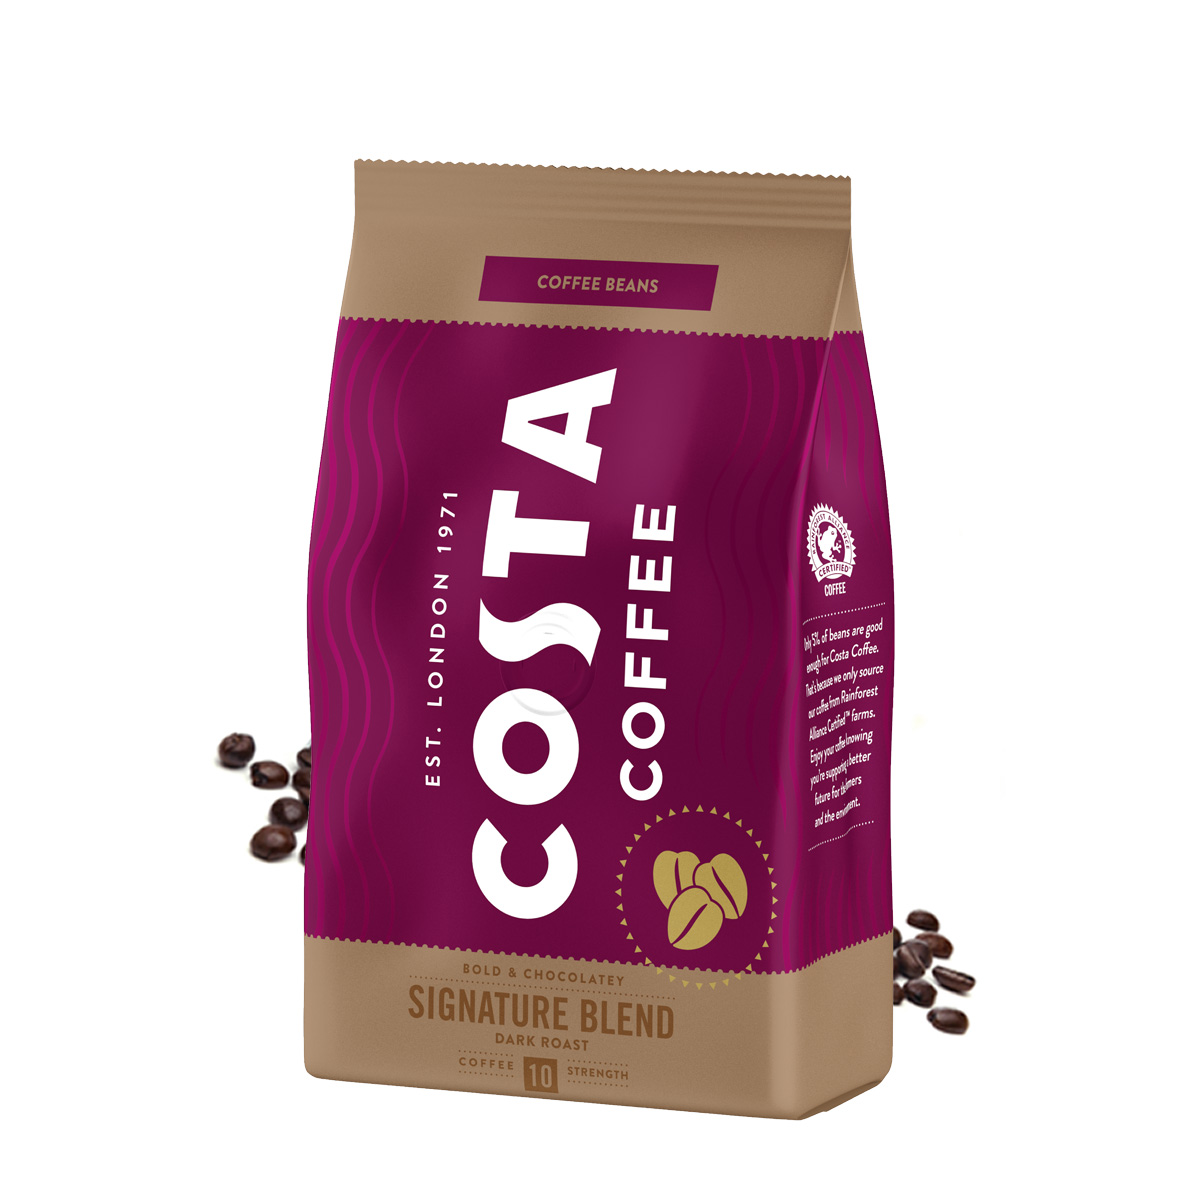 Costa Signature Blend Dark Roast cafea boabe 500g